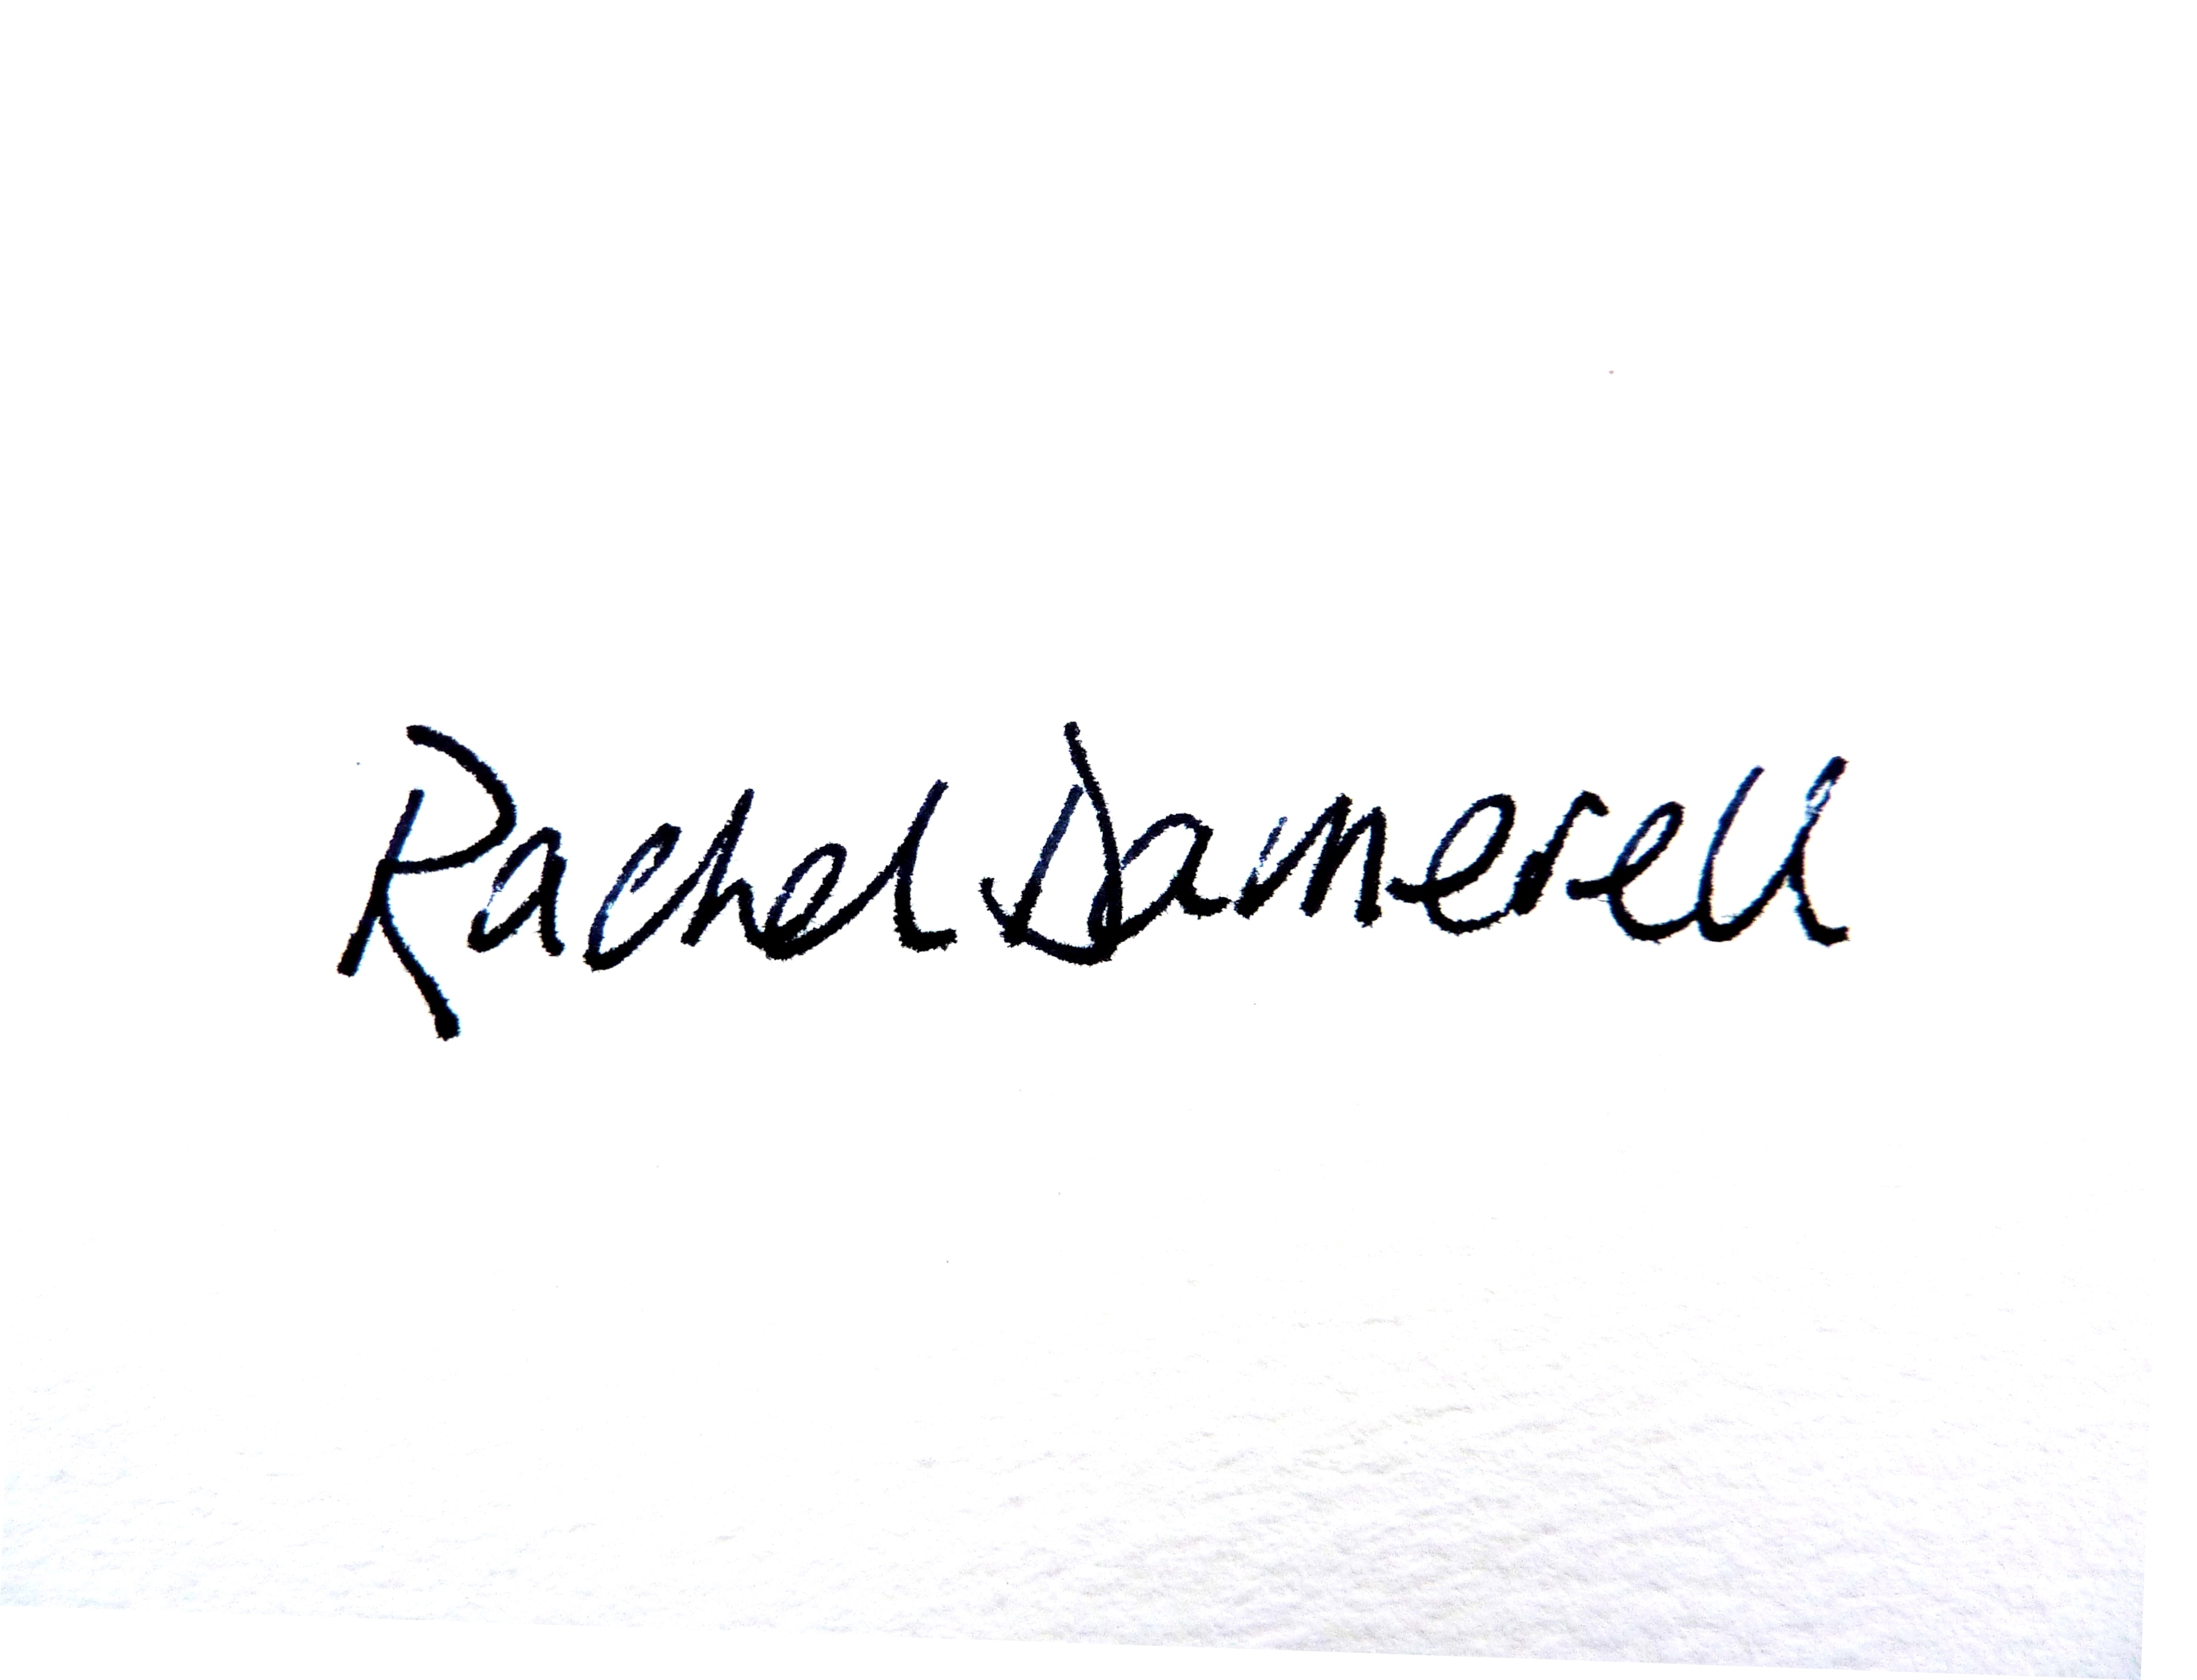 Rachel Damerell's Signature